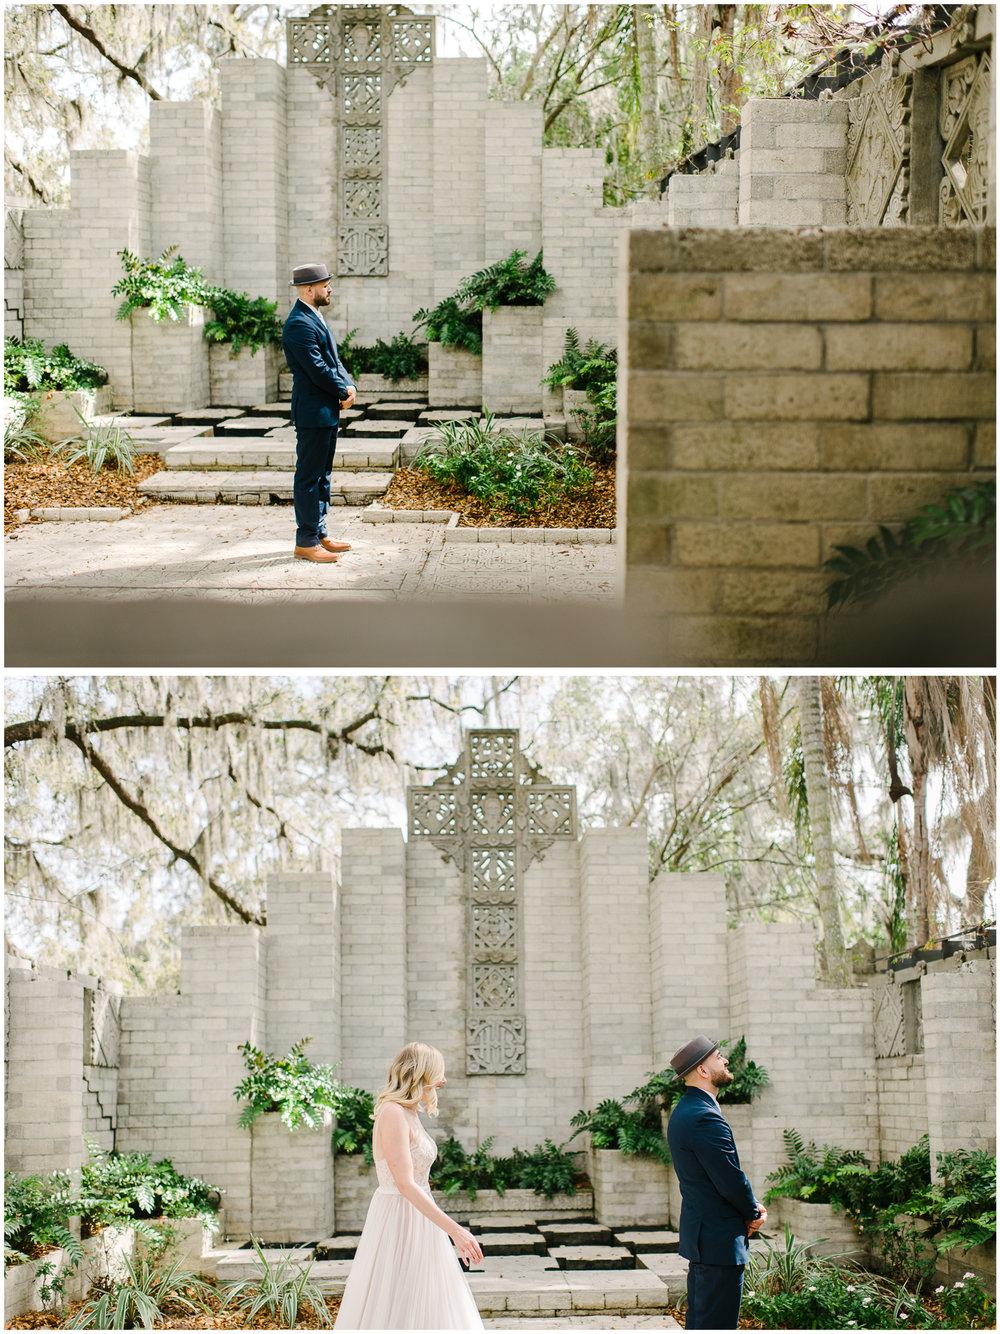 gardenpartywedding_4.jpg